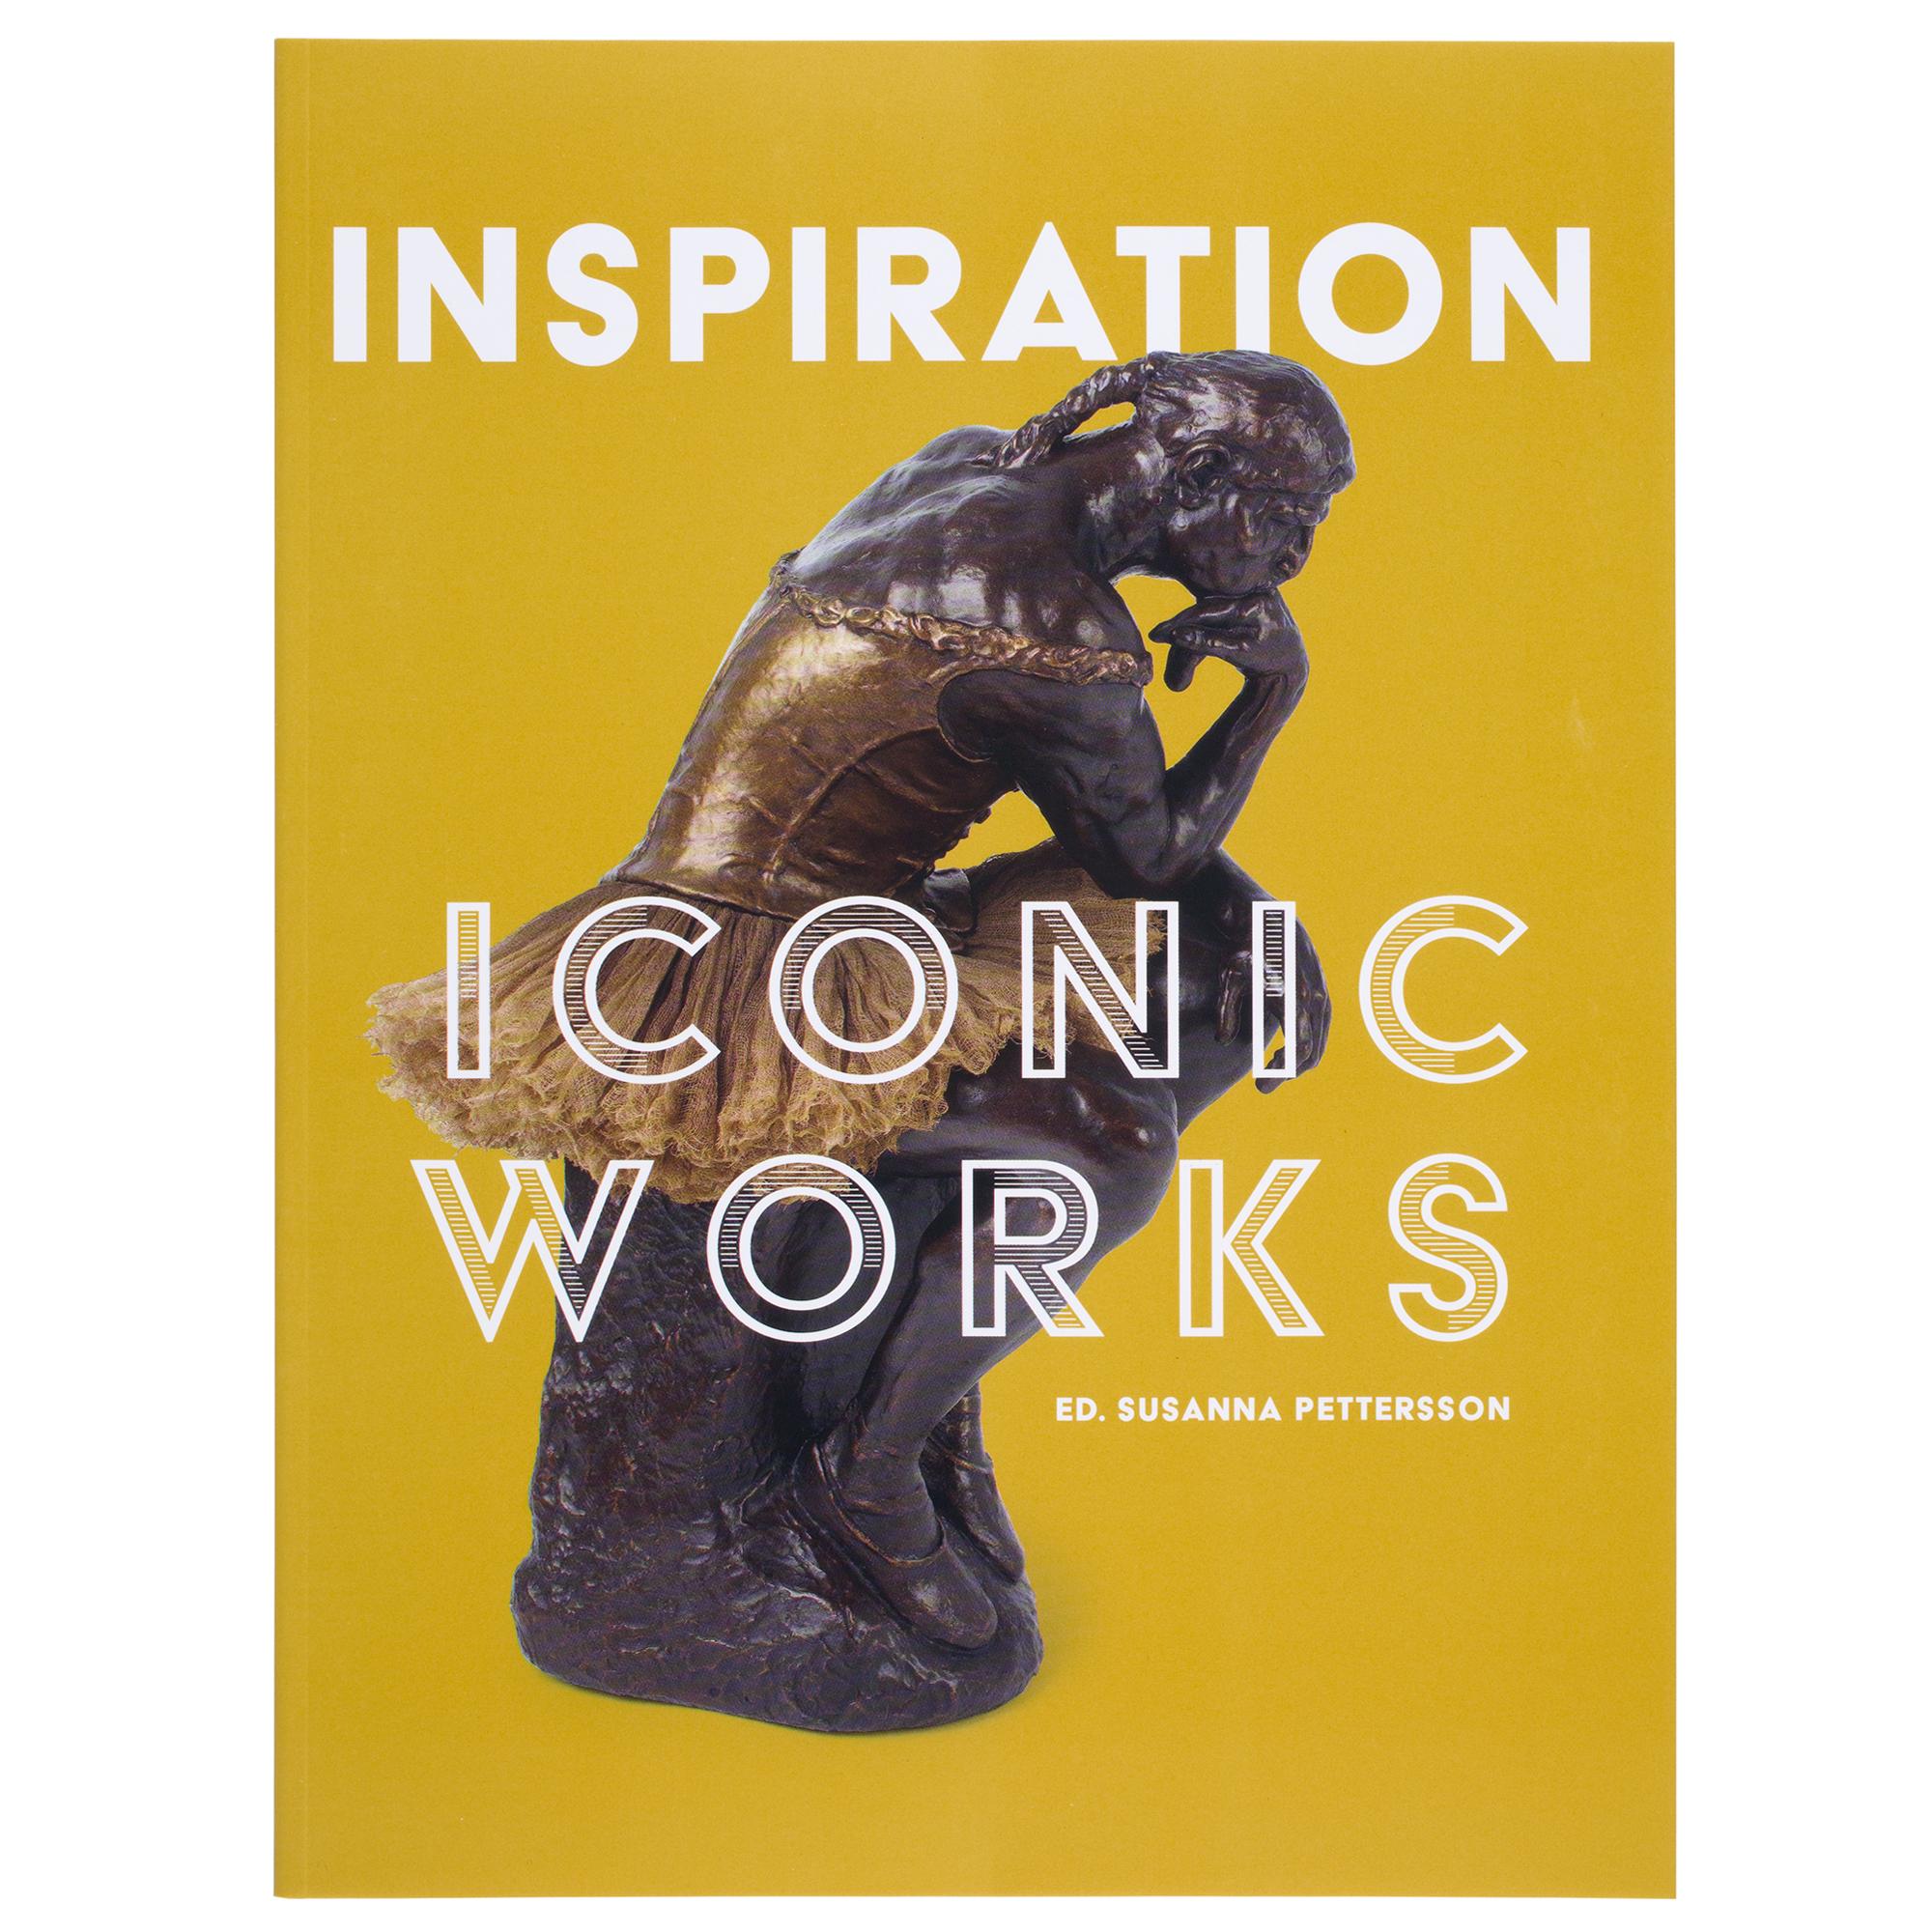 Inspiration - Iconic Works exhibition catalogue